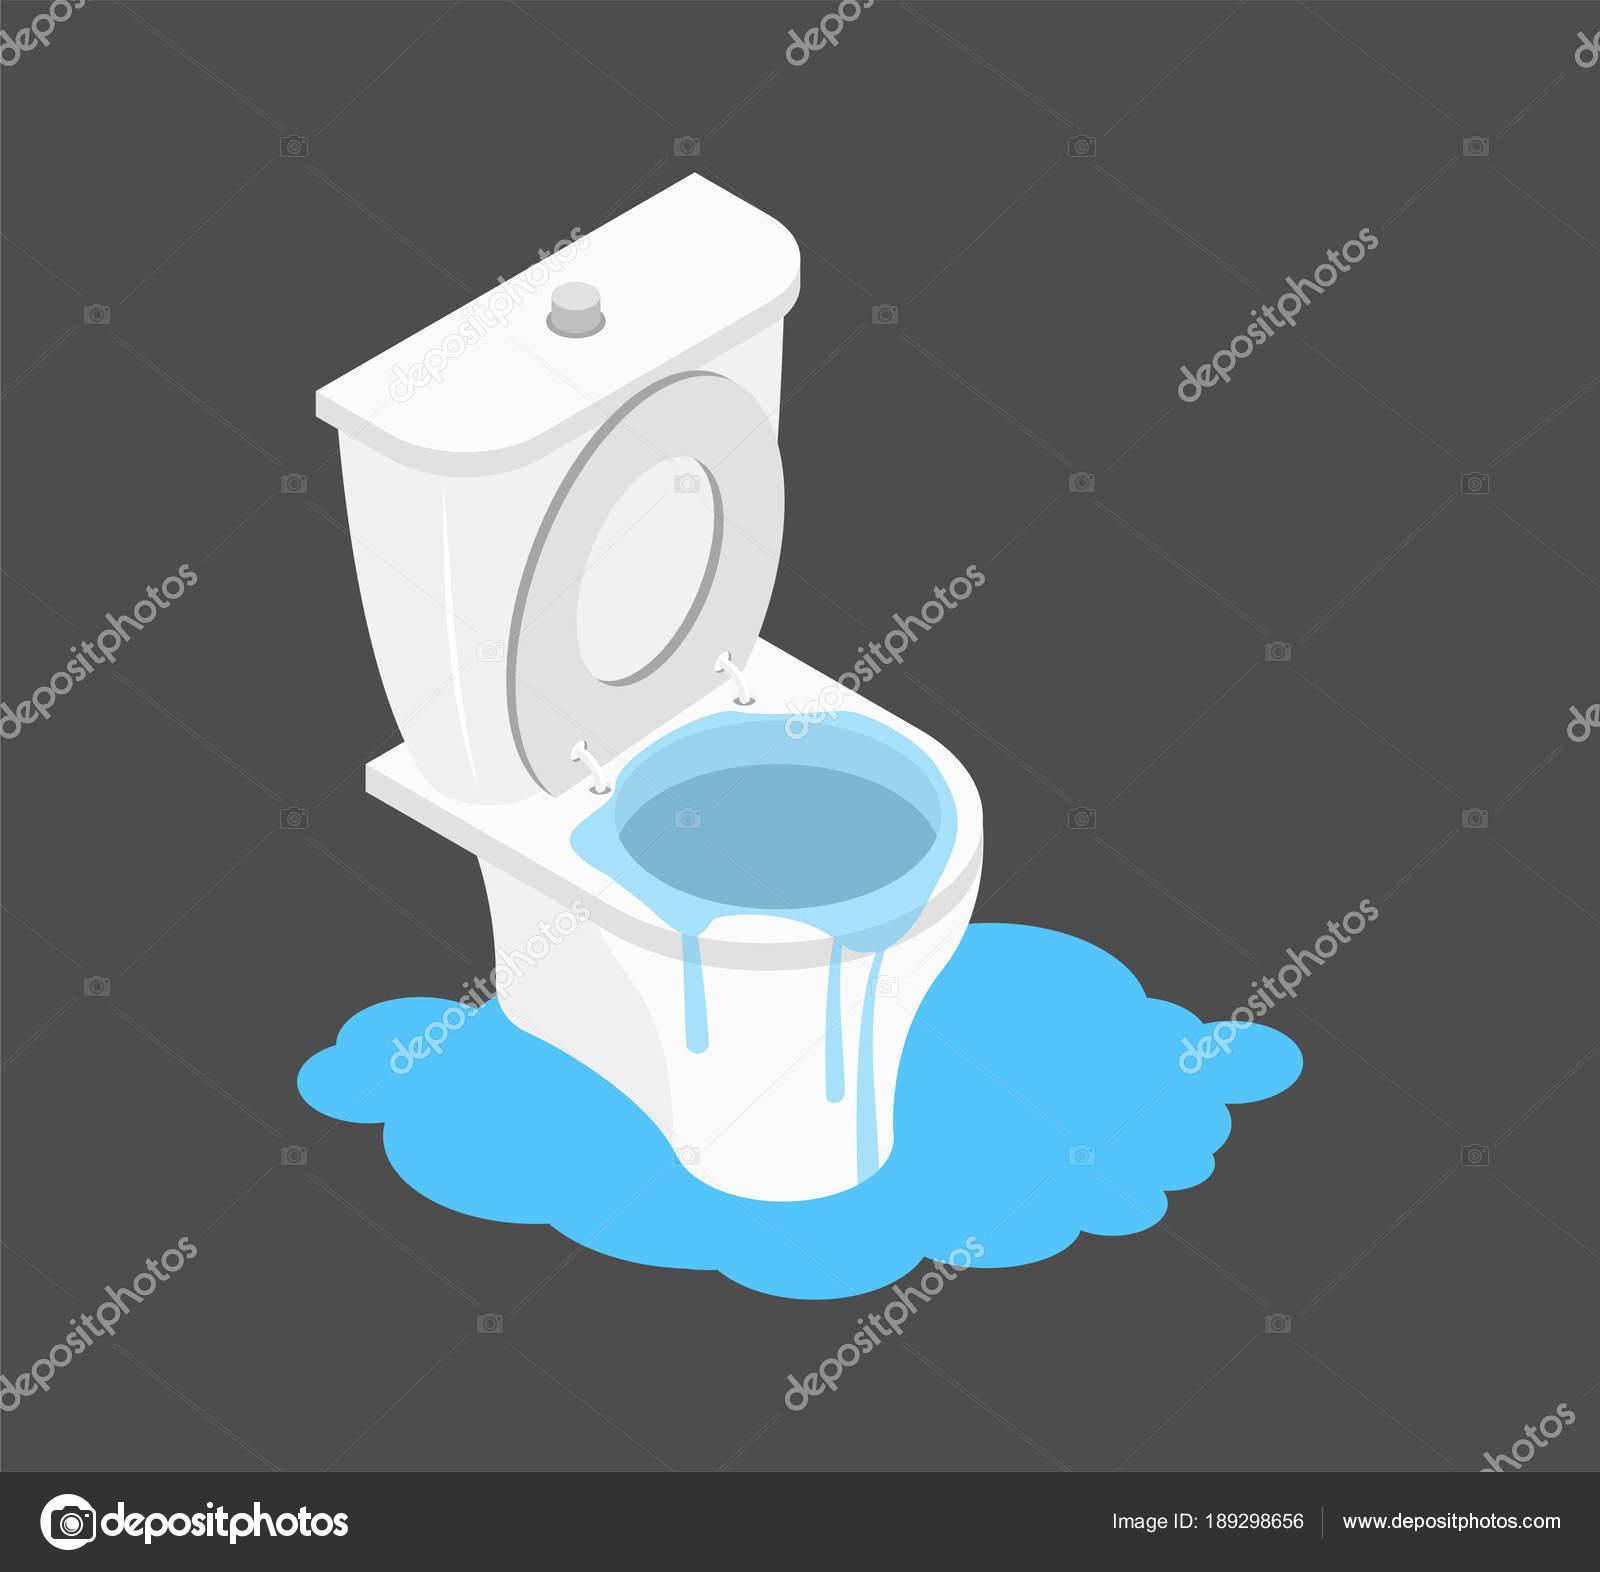 toilette verstopft isometrie. leckage kanalisierung. wurf im wc